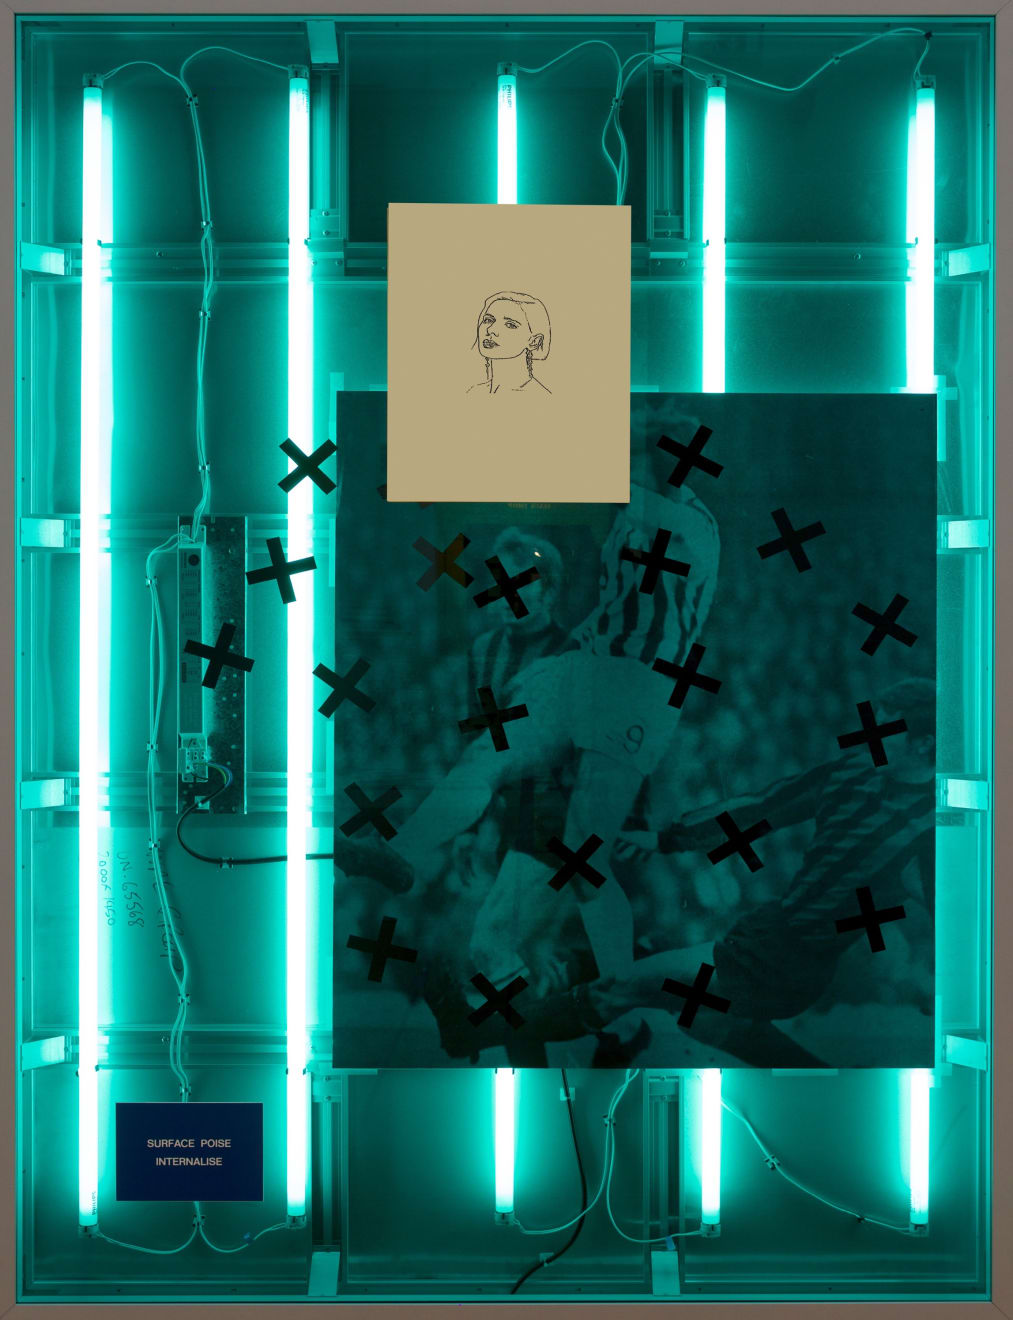 Simeon Barclay, Truly Madly Deeply #2, 2017, Aluminum Lightbox, Acrylic, Inkjet Print, Brass, 200 x 145 x 11.5 cm